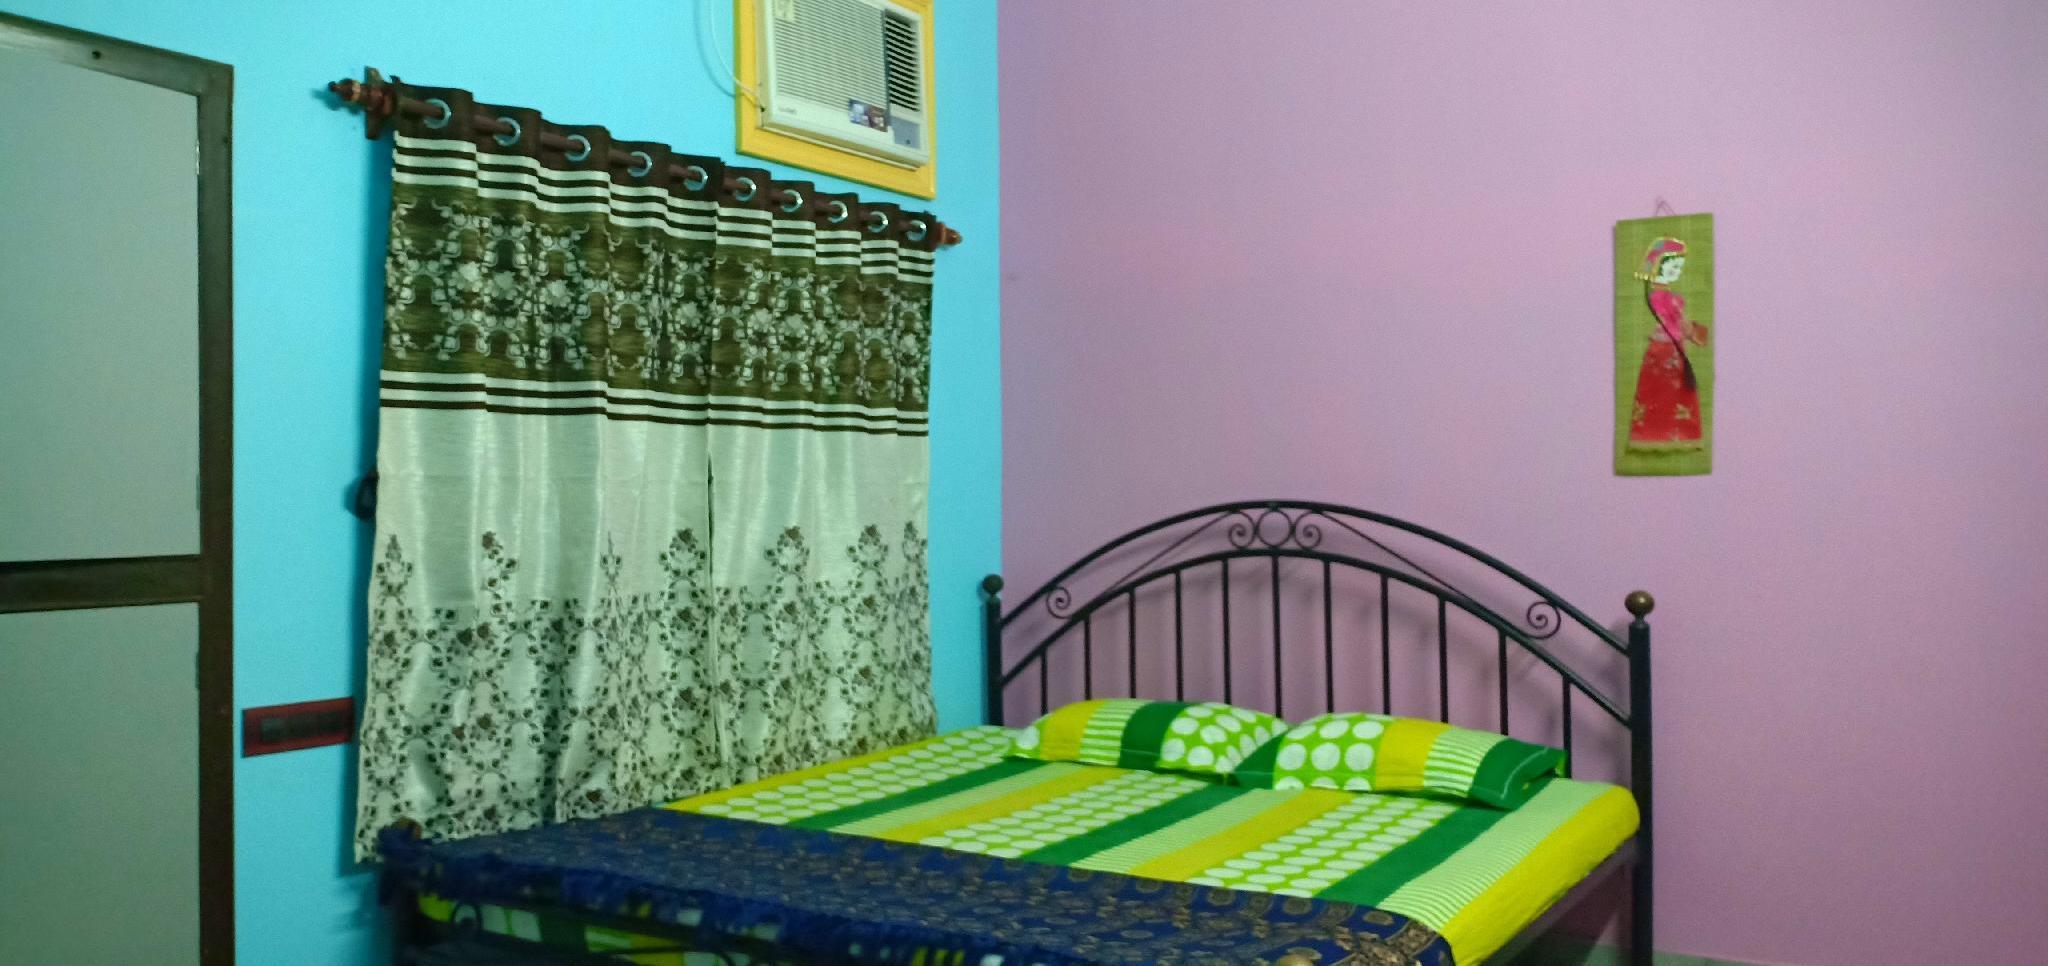 Mithi's Sweet Home